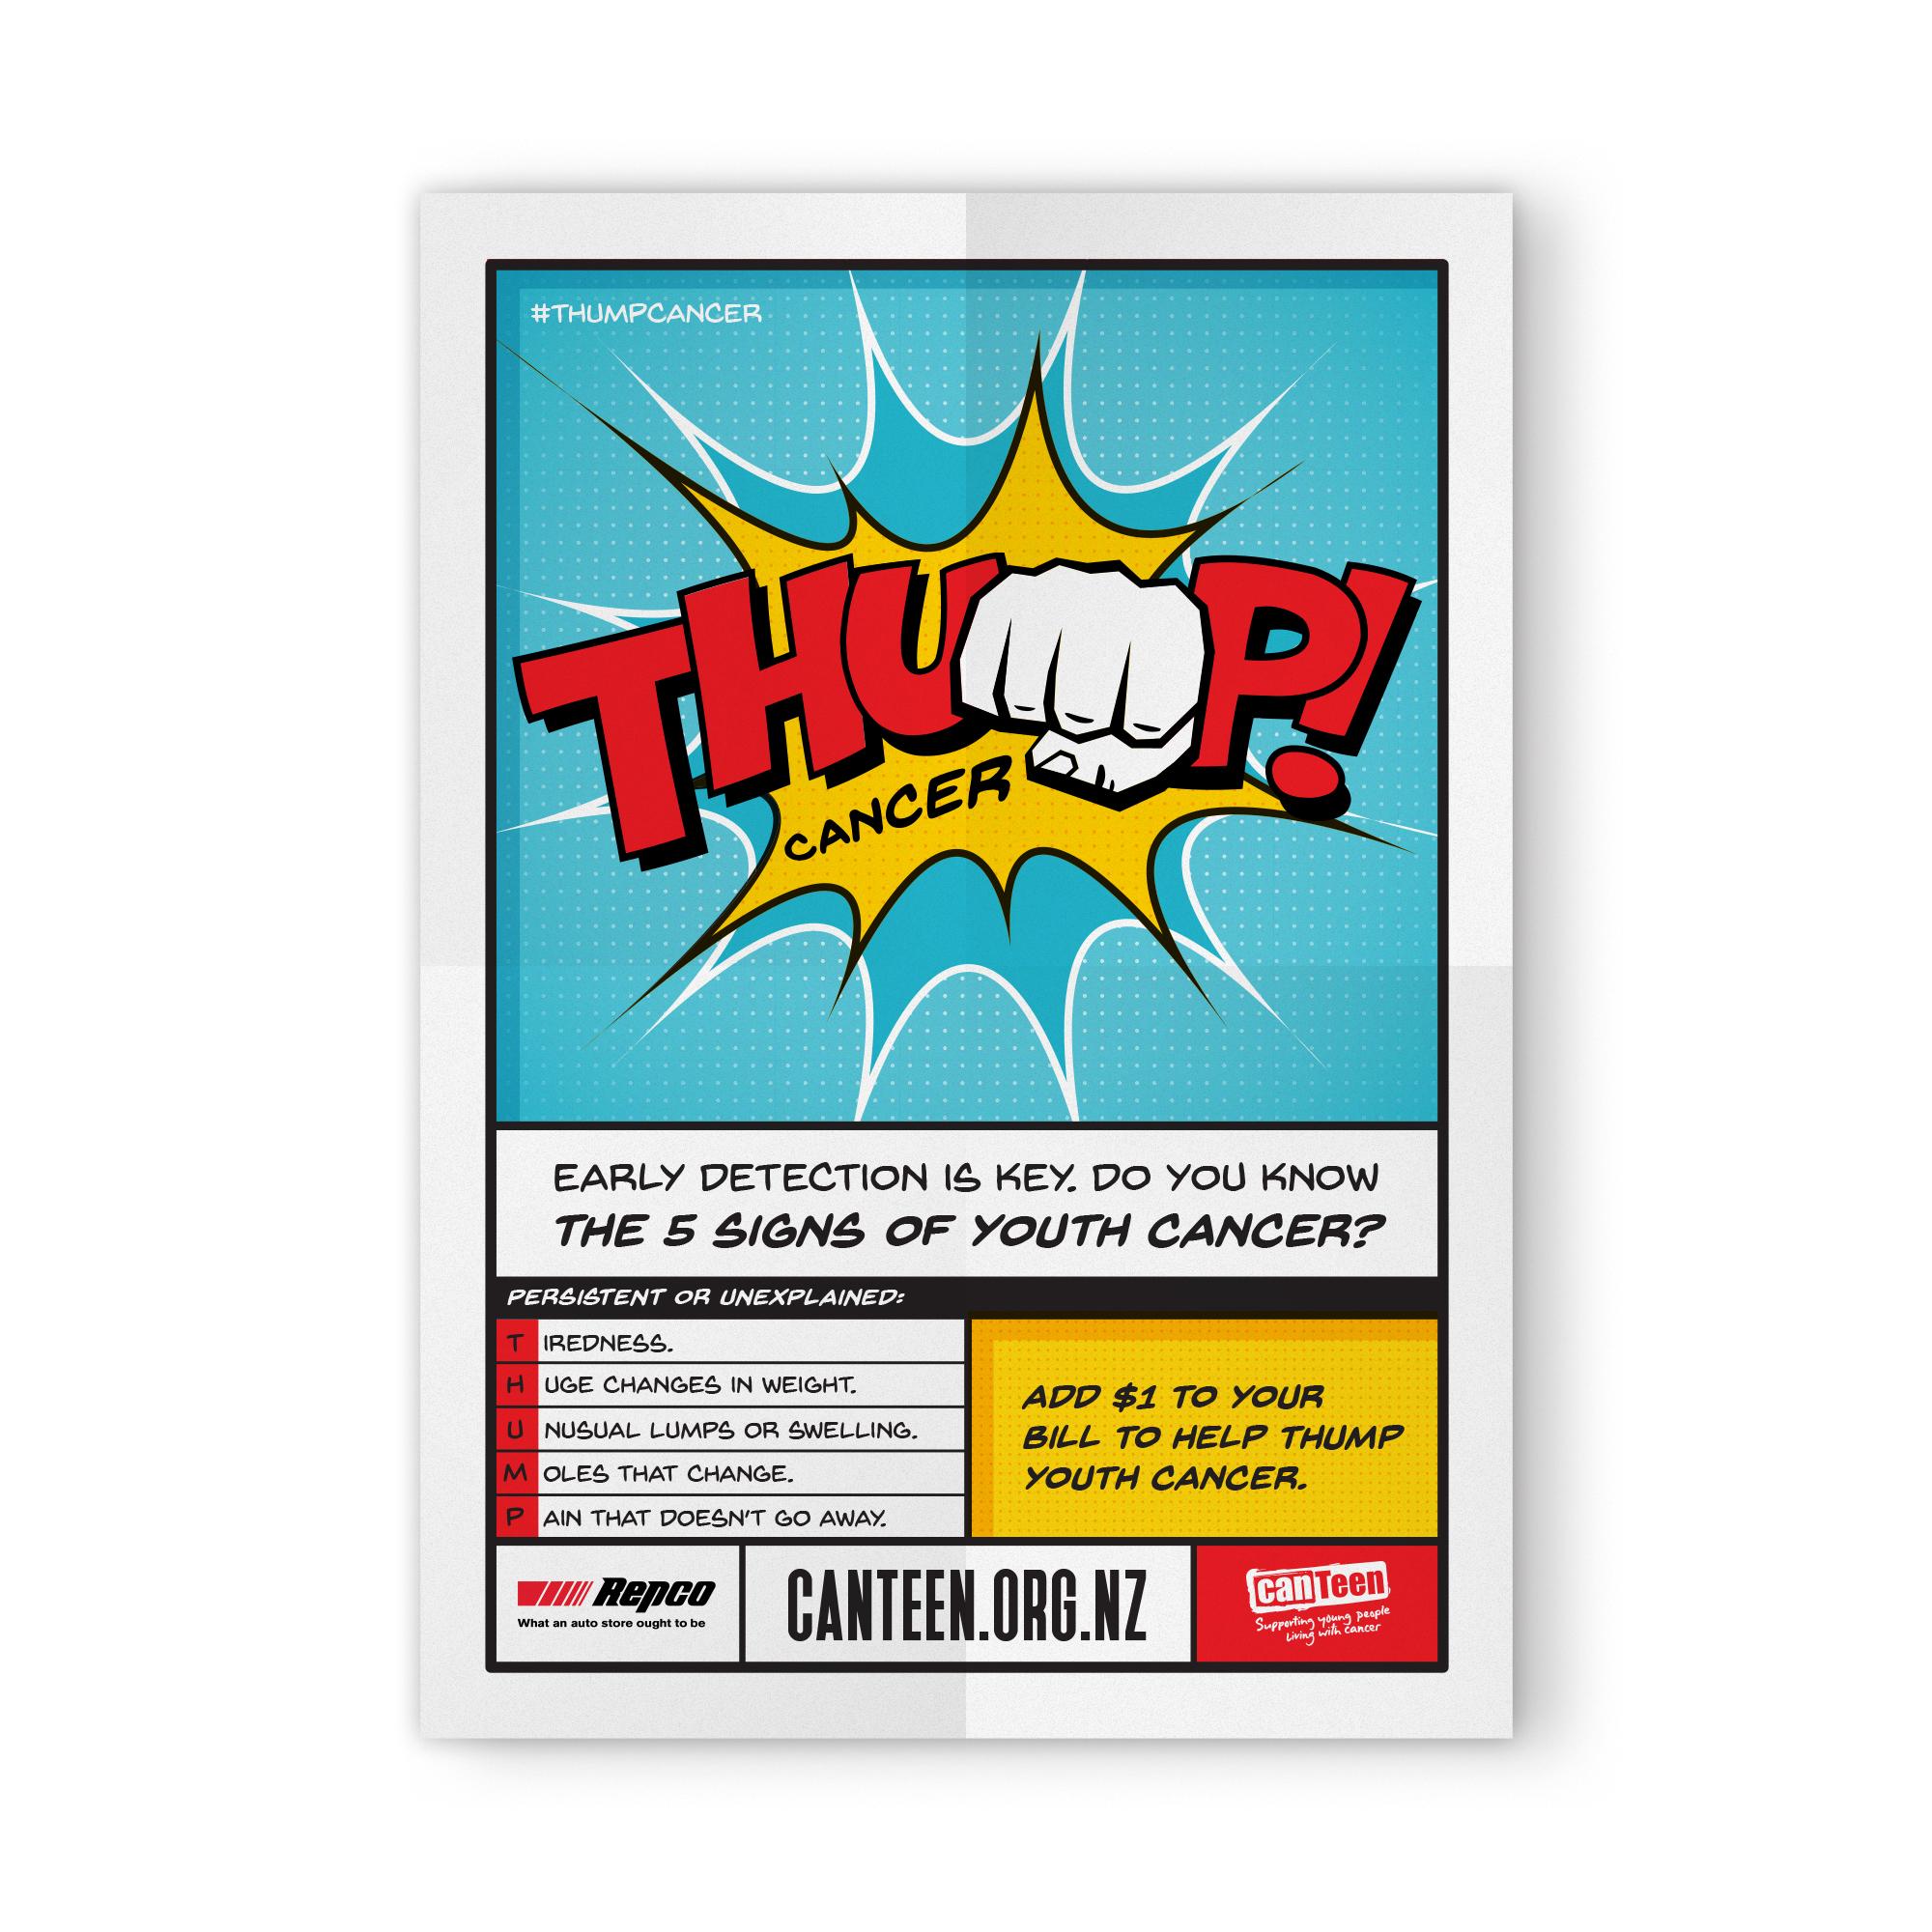 Thump Cancer poster_1.jpg